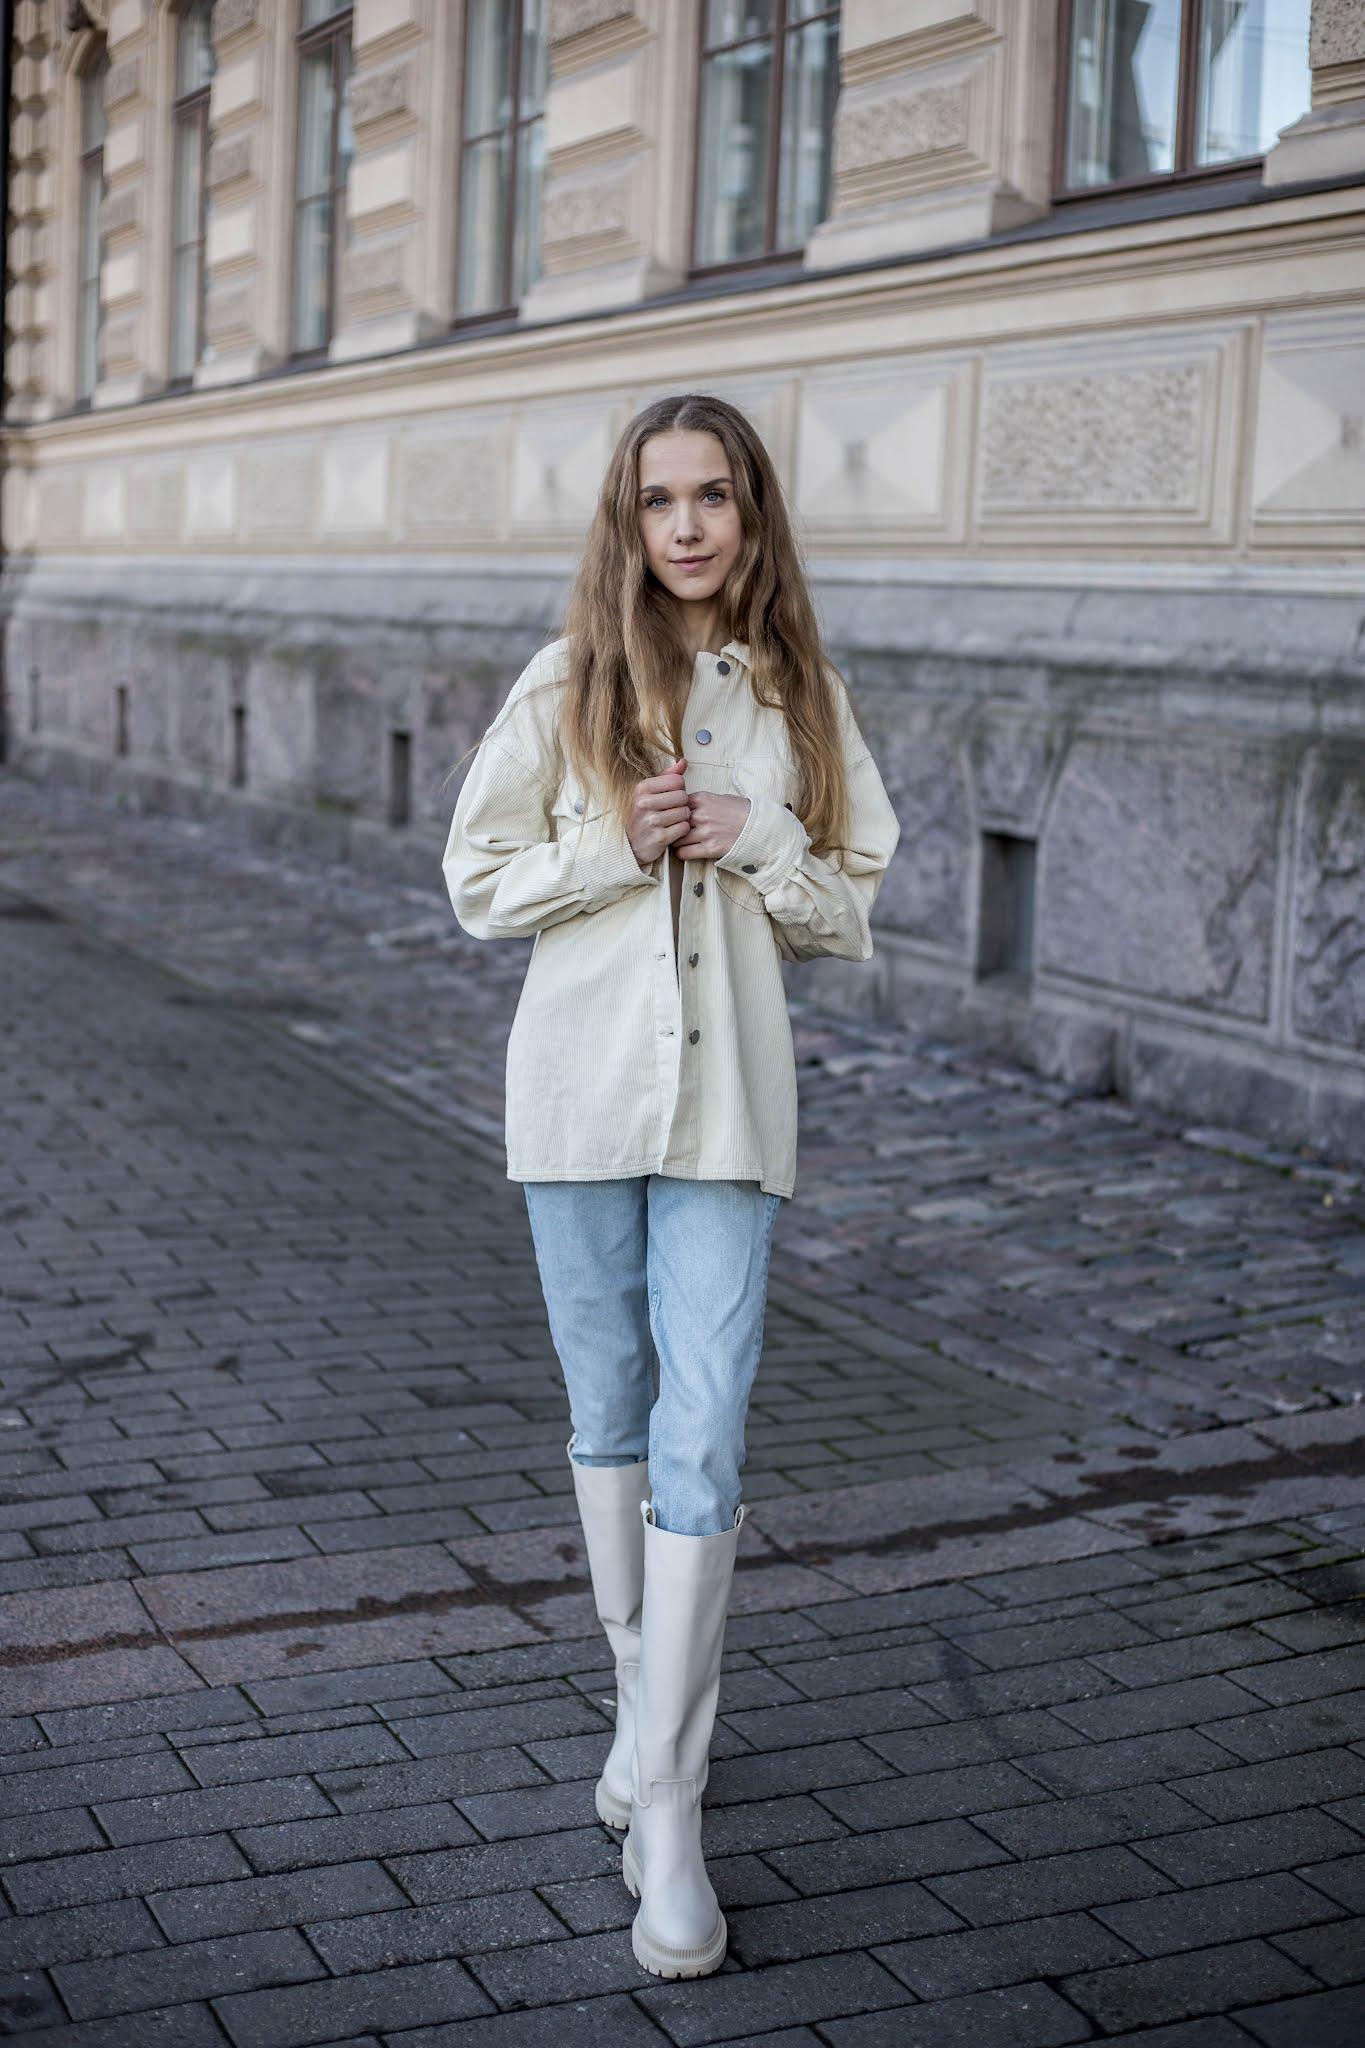 Rento arkiasu: farkut ja vakosamettipaita // Casual outfit: jeans and corduroy shirt